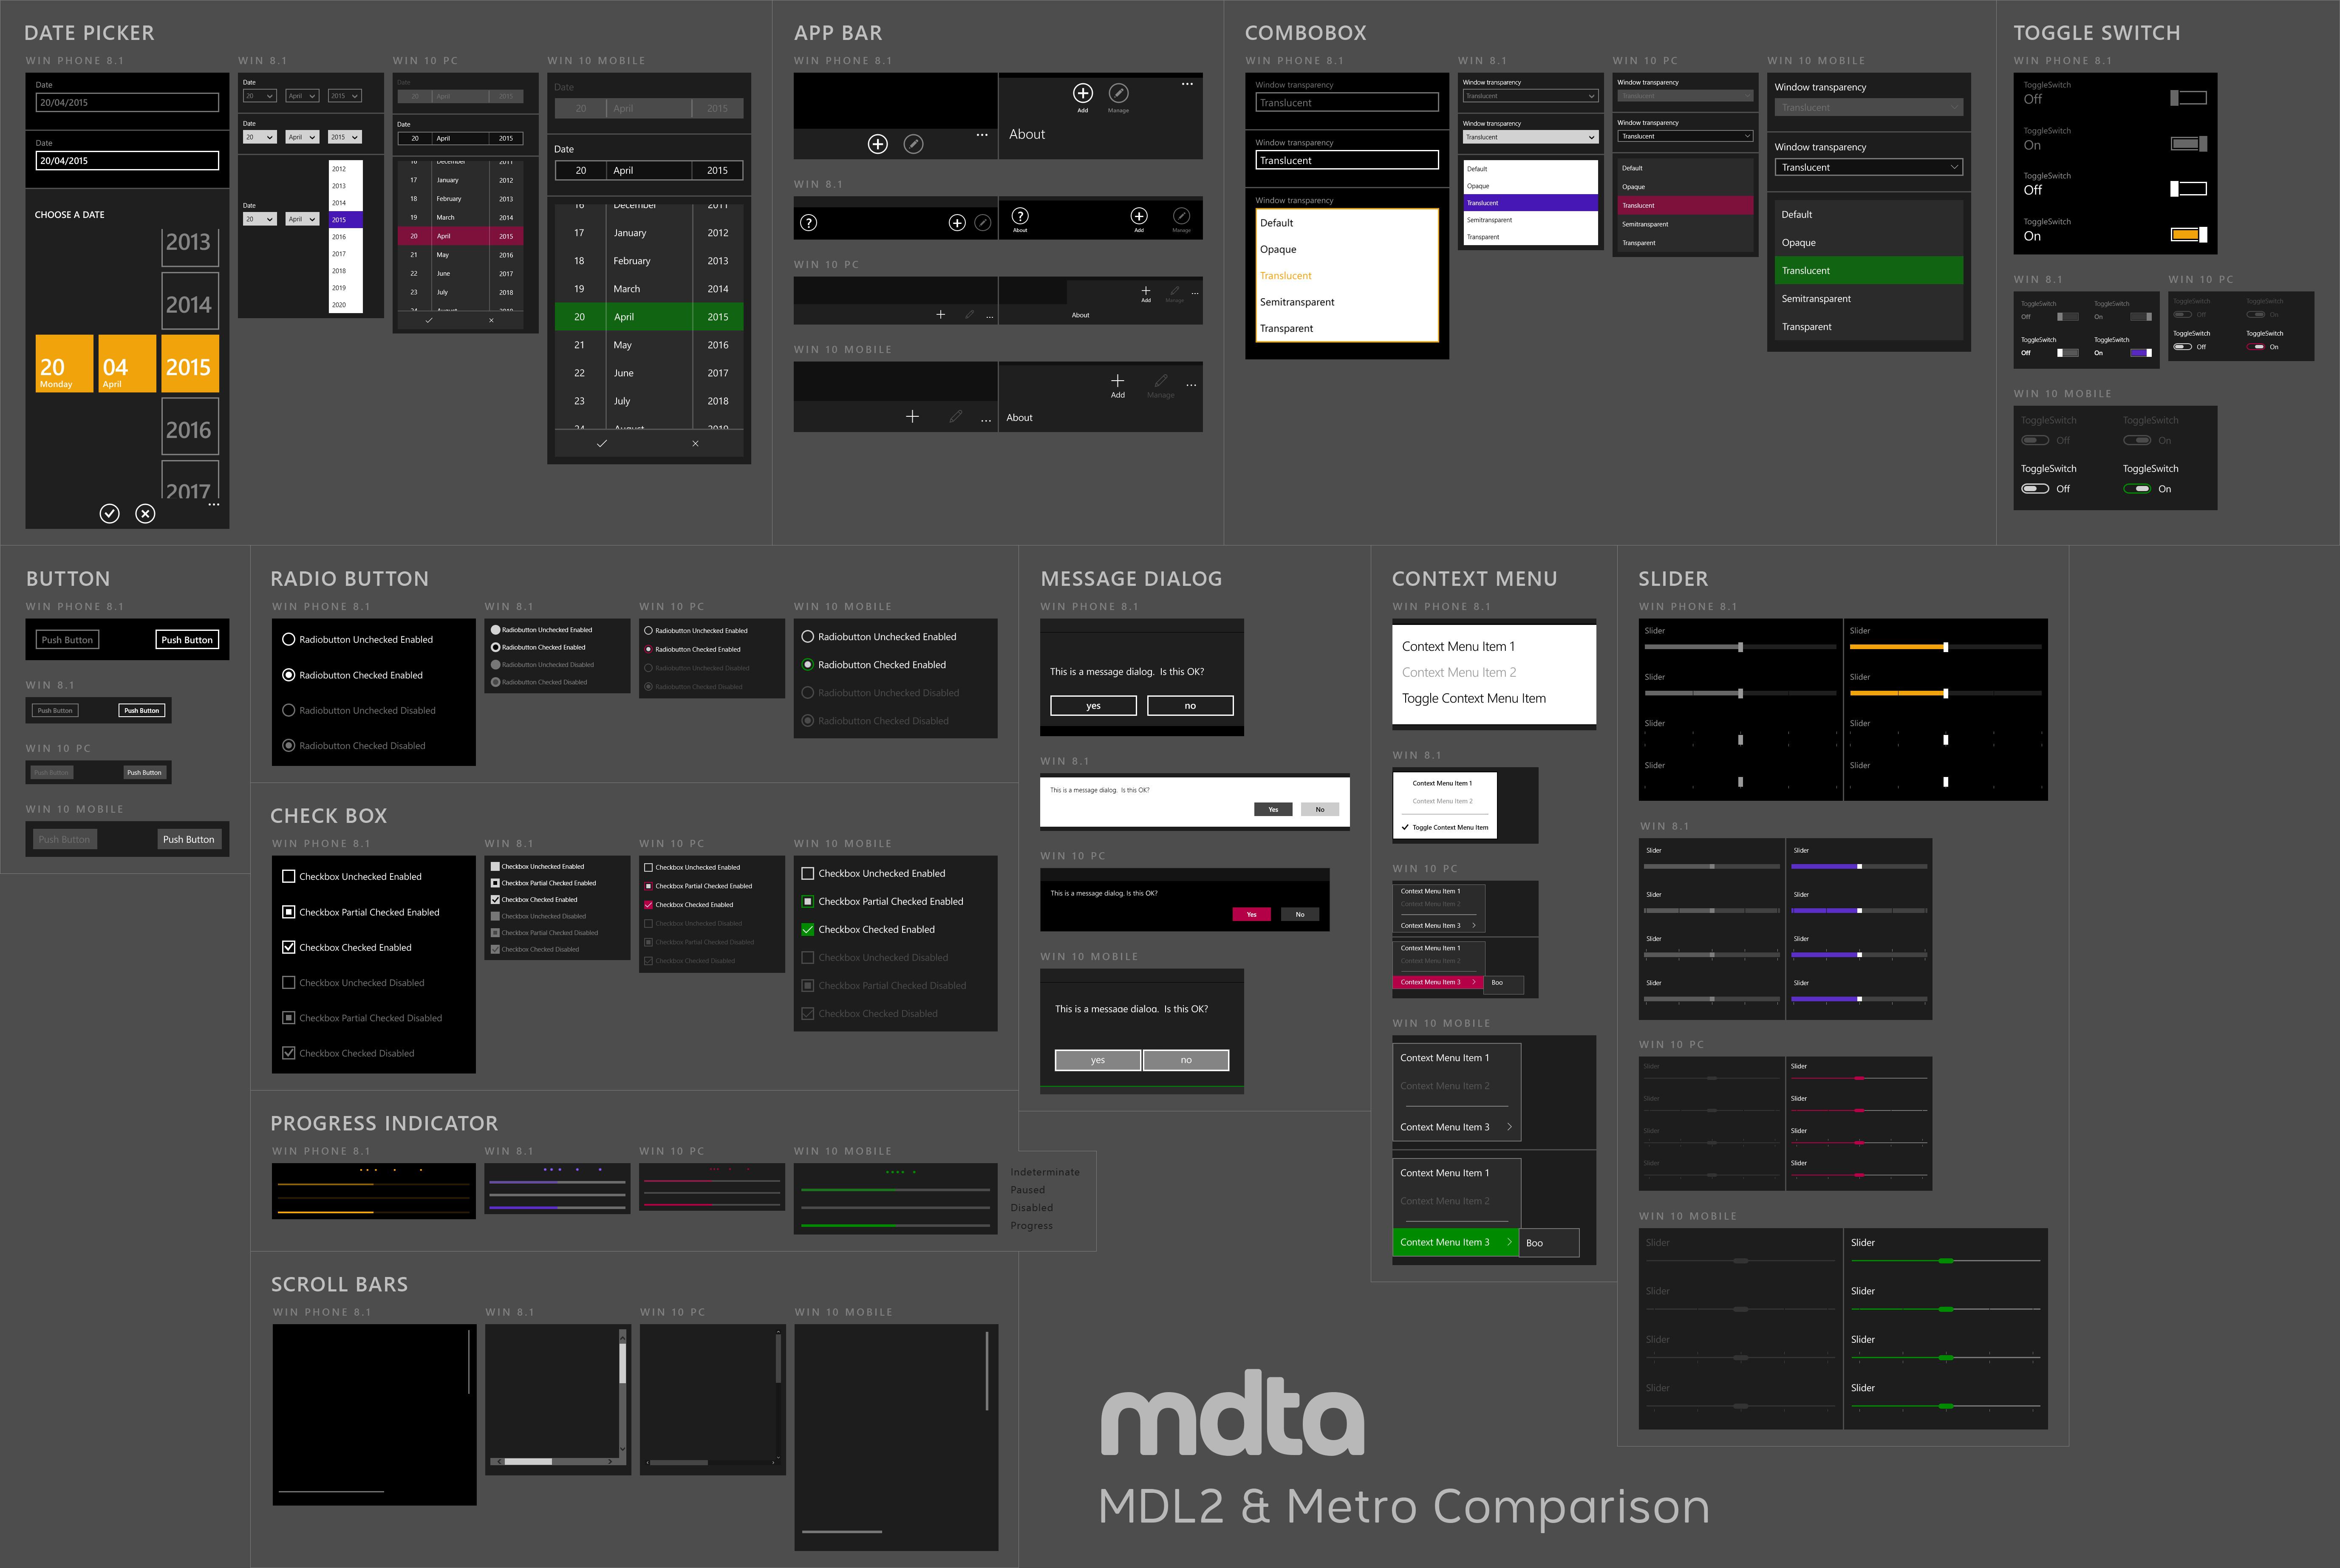 En 2017 microsoft va retravailler toute la charte for Window design ms